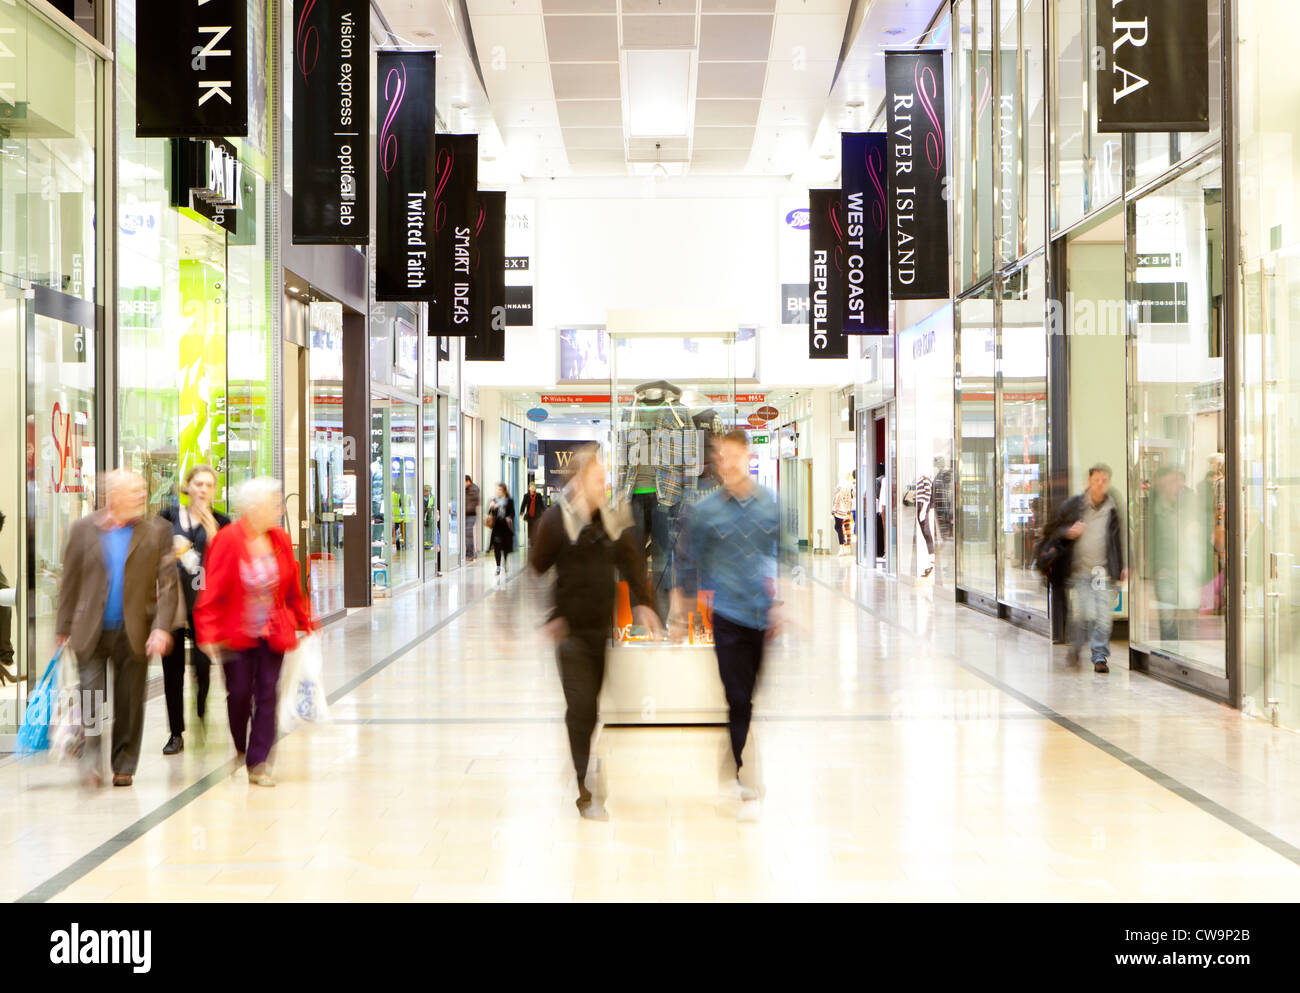 Telford Shopping Centre, Telford, Shropshire - Stock Image